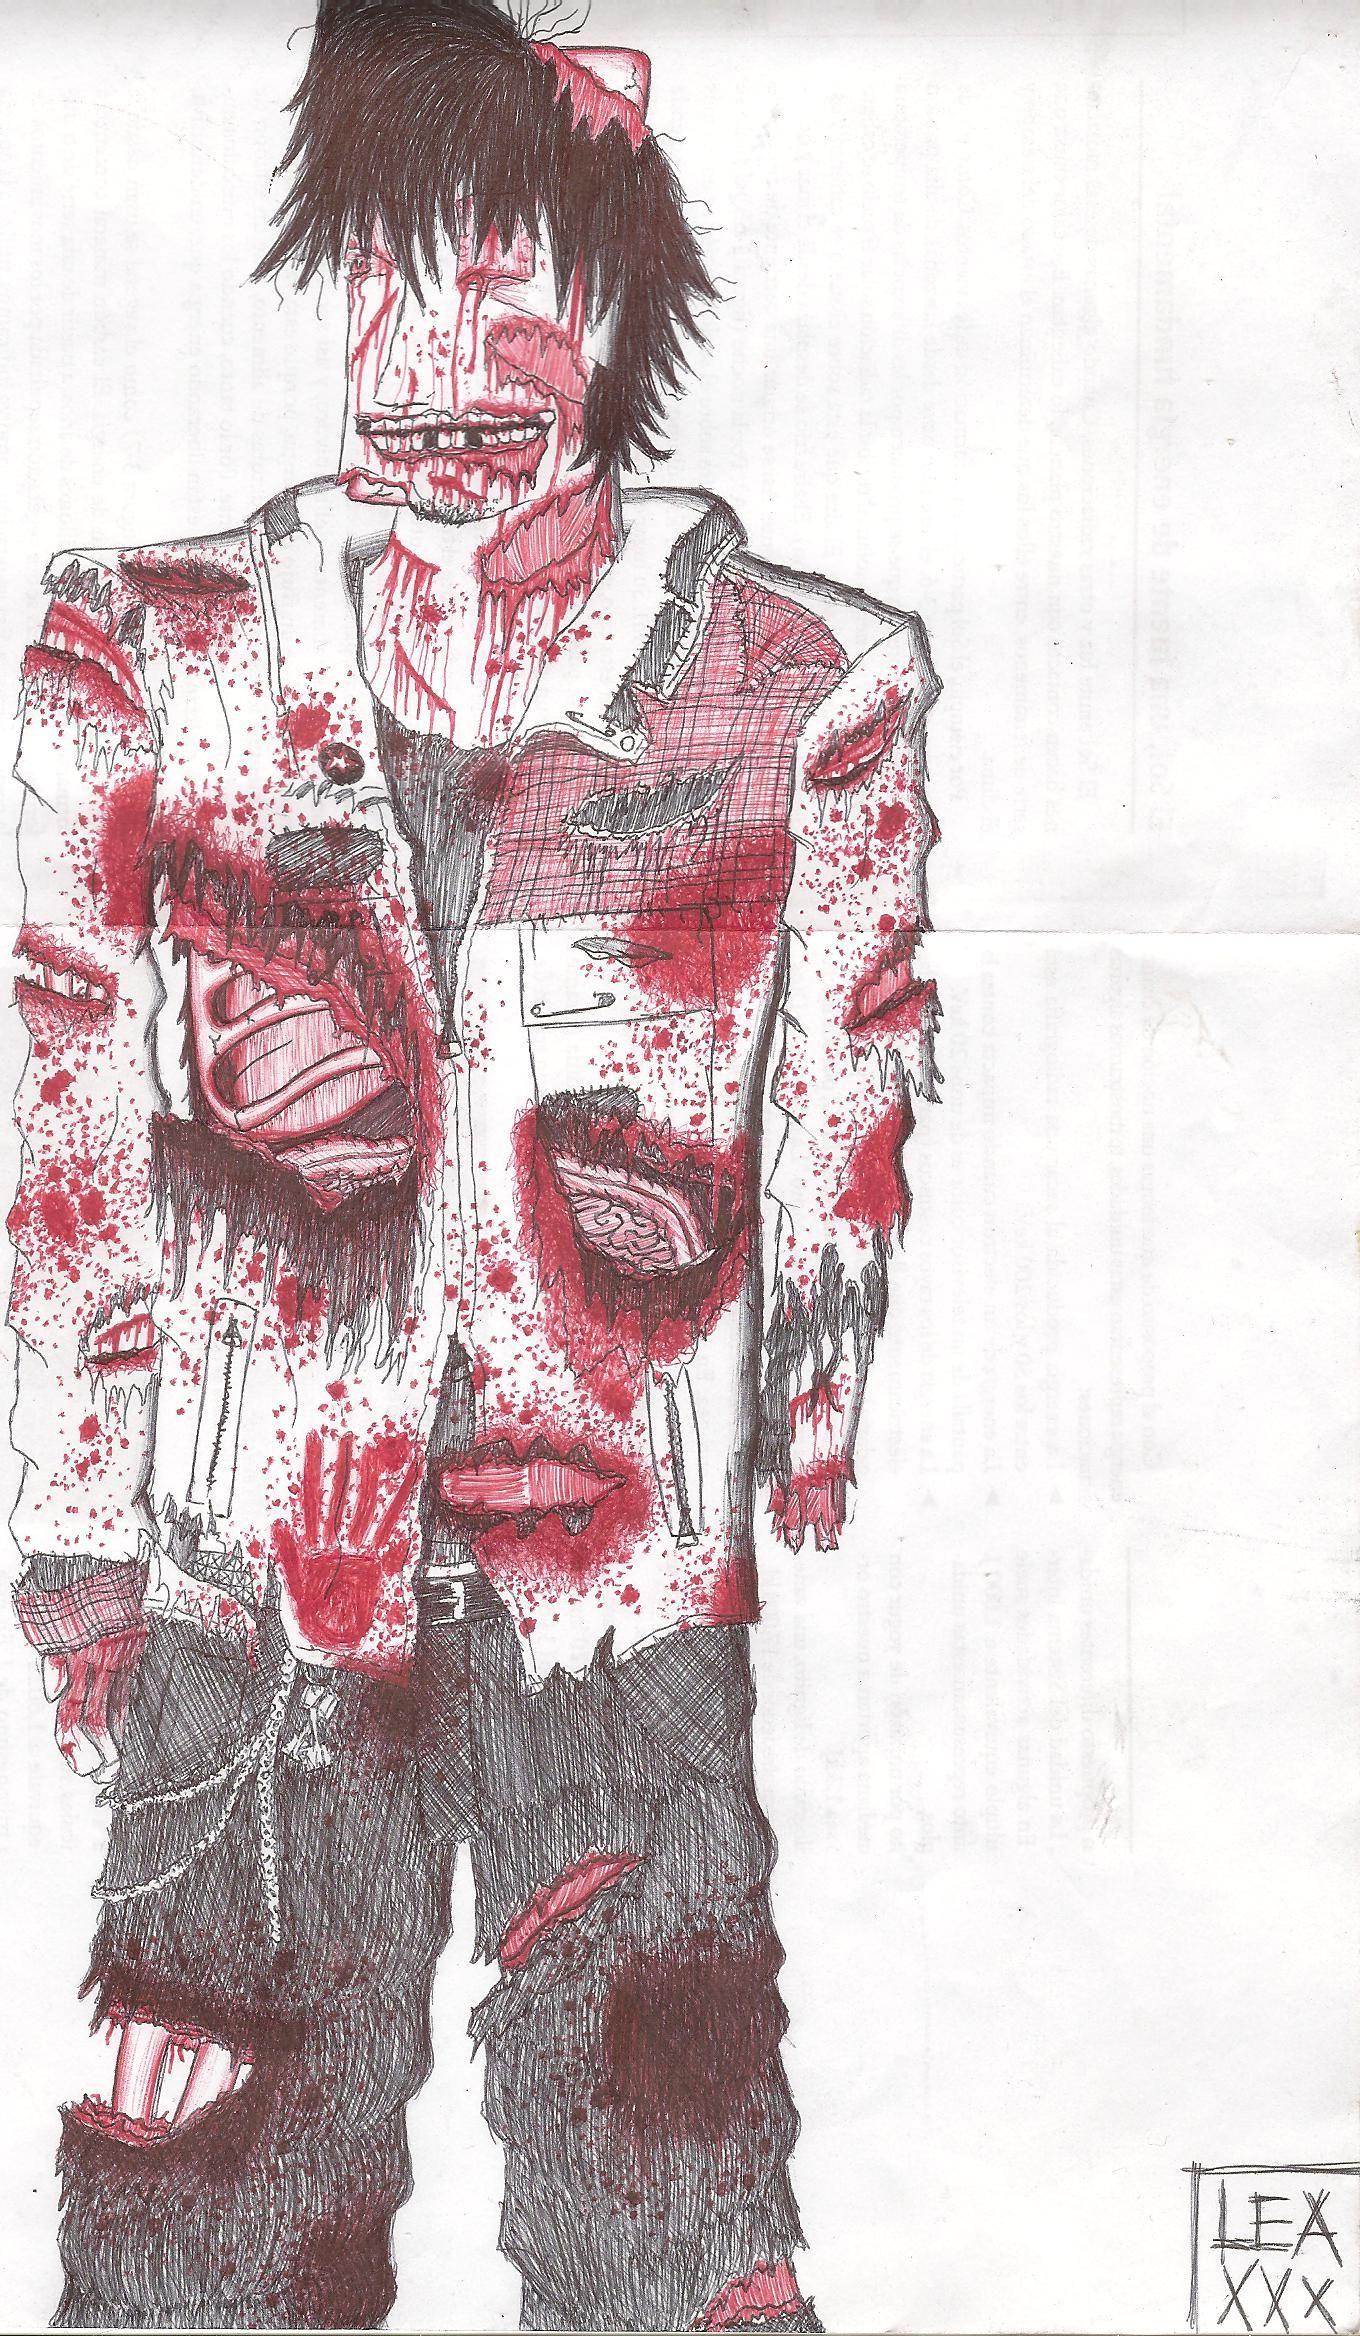 DEADPHOBIA 12 (Mr. Asshole)